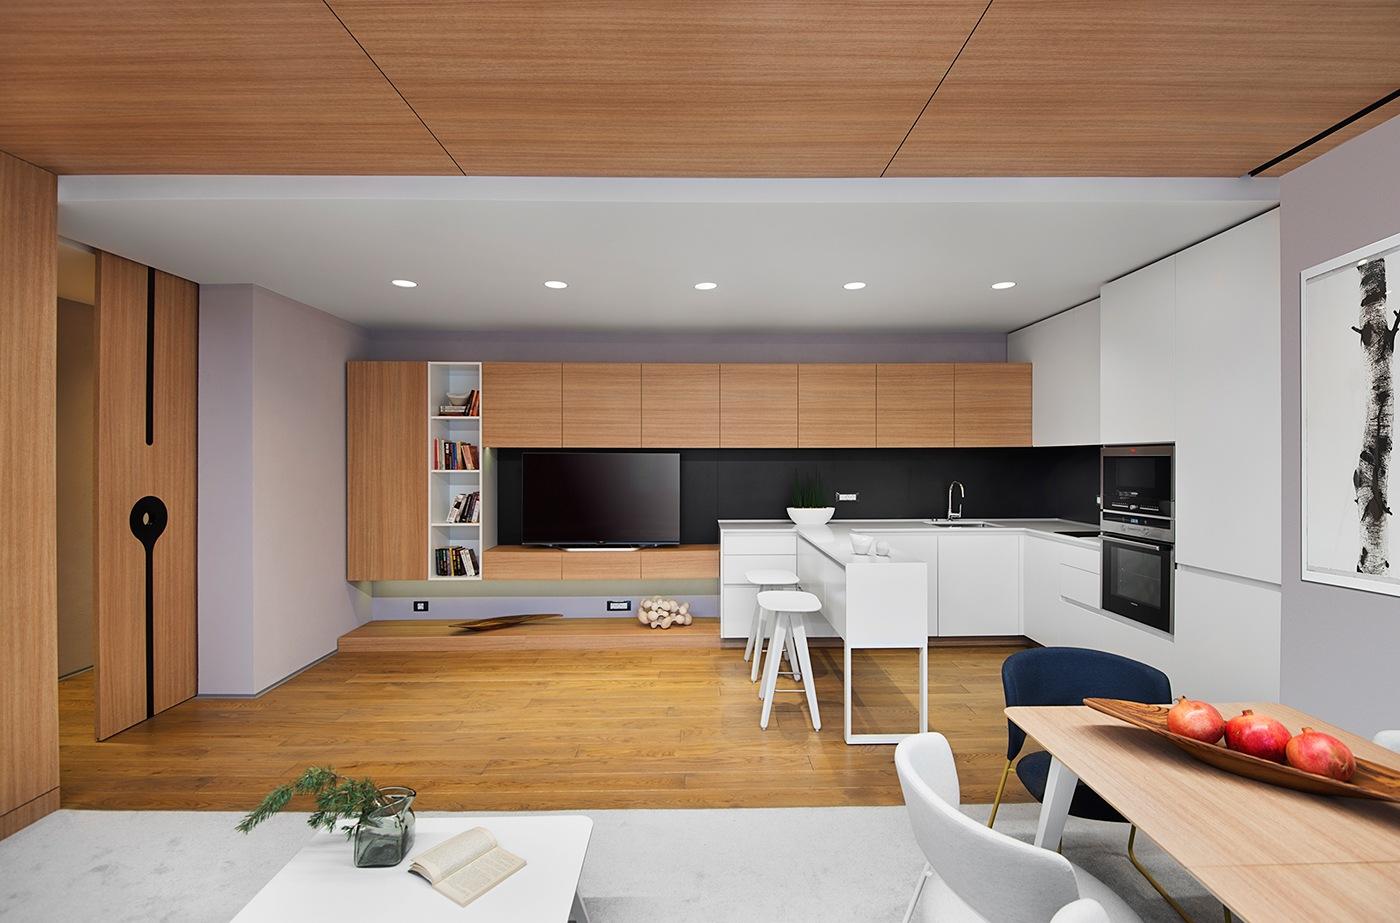 Minimalist apartment design with simple wooden interior for Apartment design wood